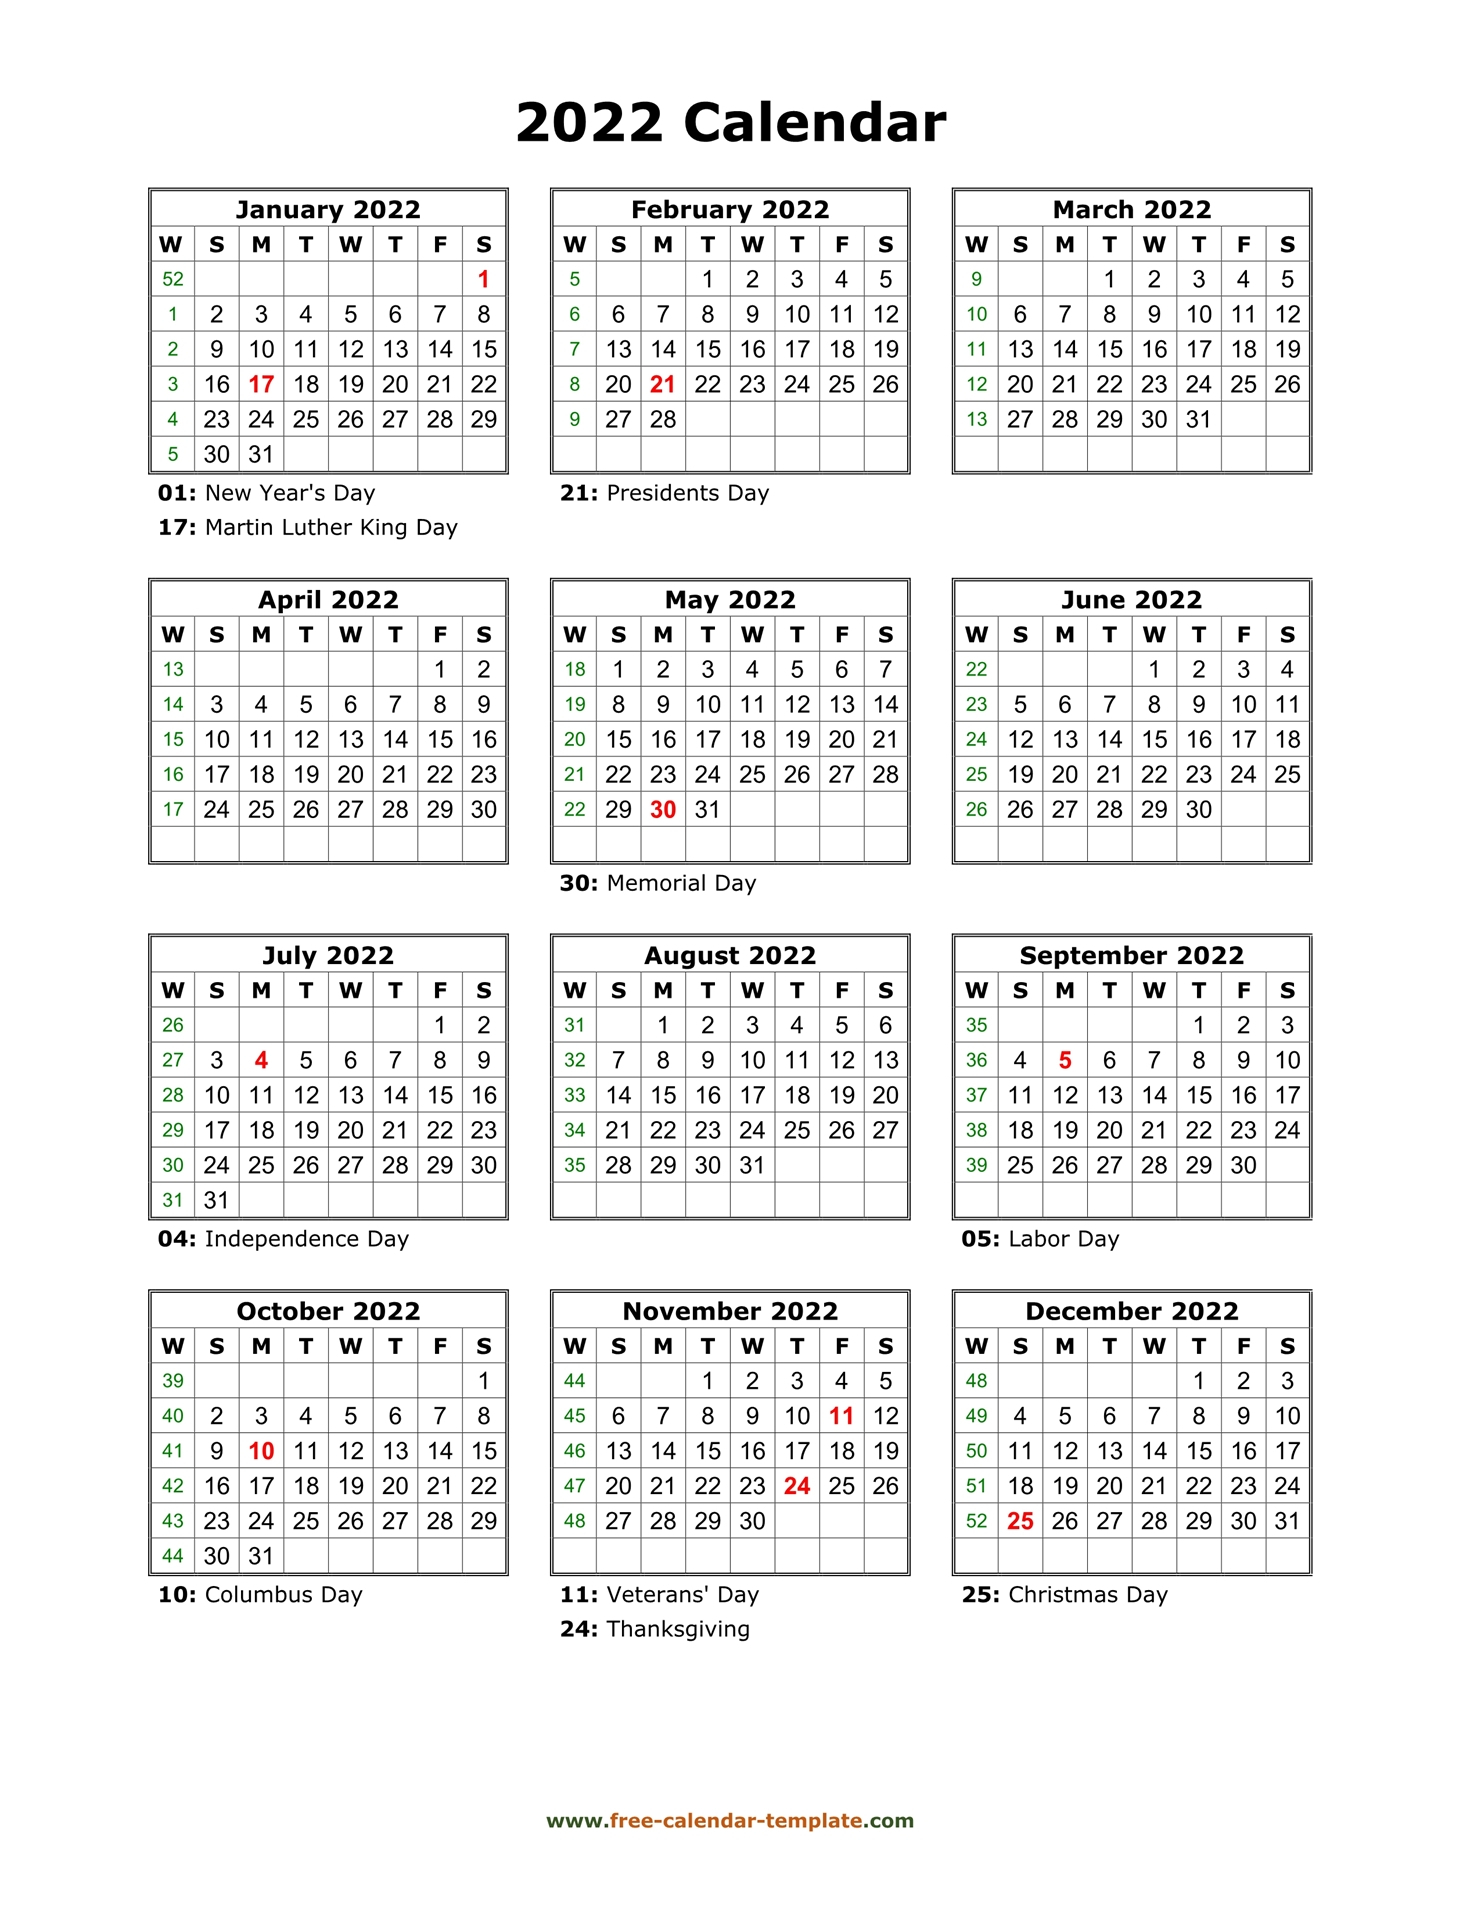 Free-Calendar-Template